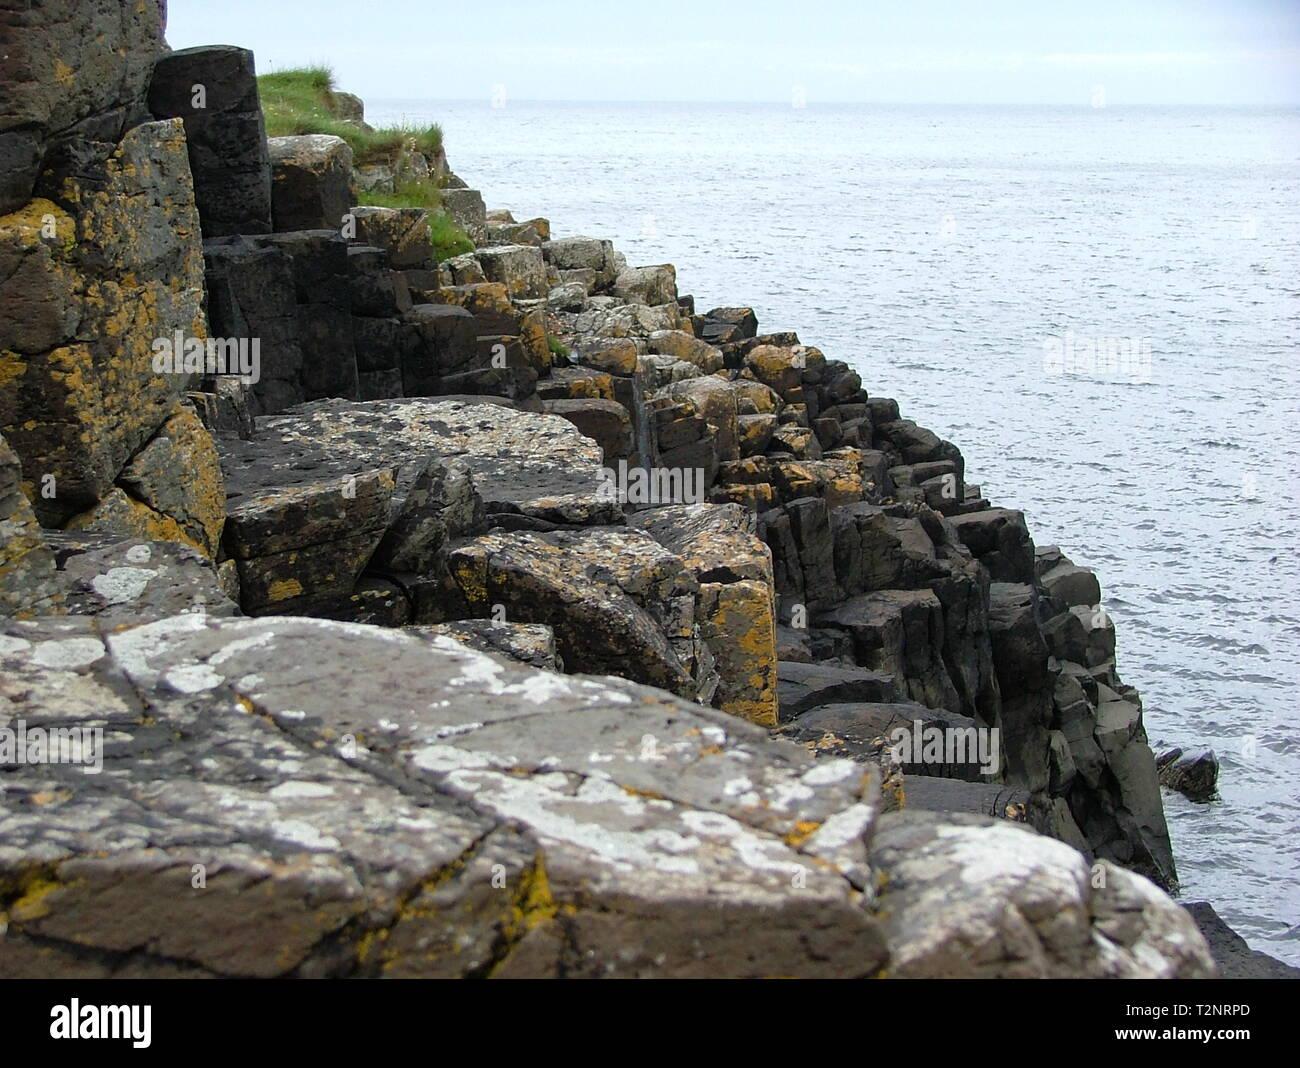 Giant's Causeway, Bushmills - Stock Image